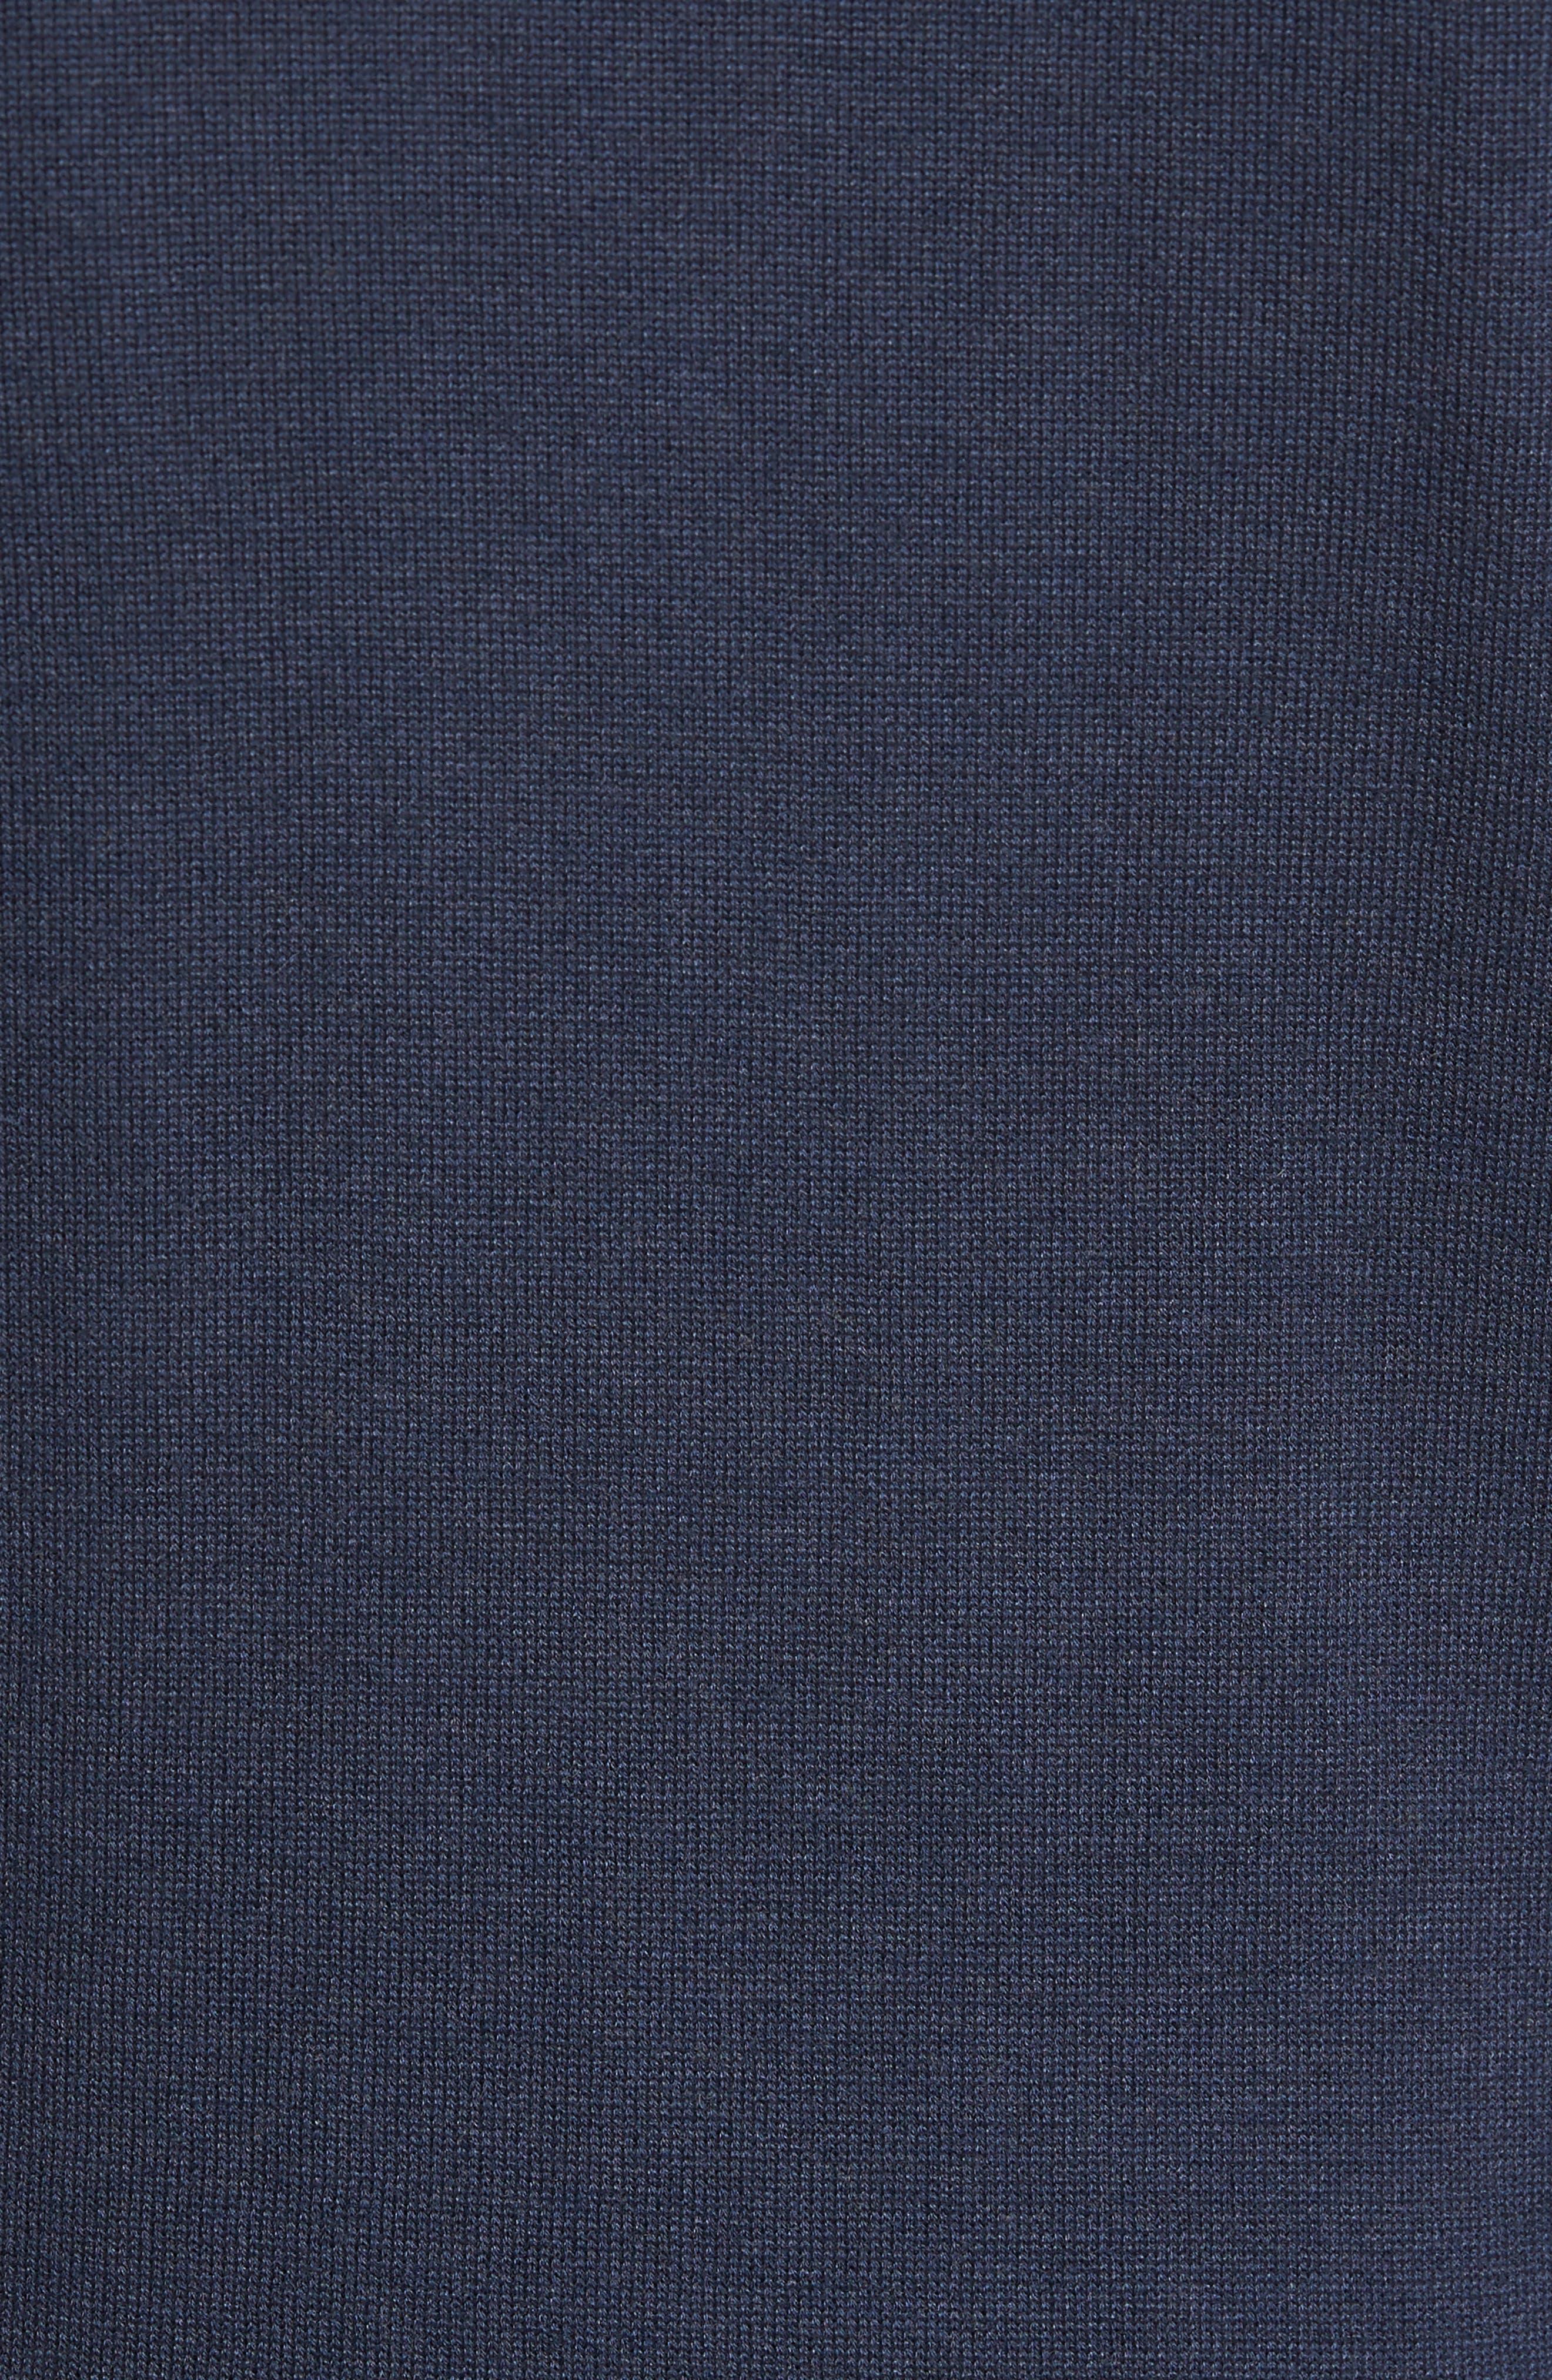 Anotny Morato Pattern Sweater,                             Alternate thumbnail 5, color,                             Soft Blue